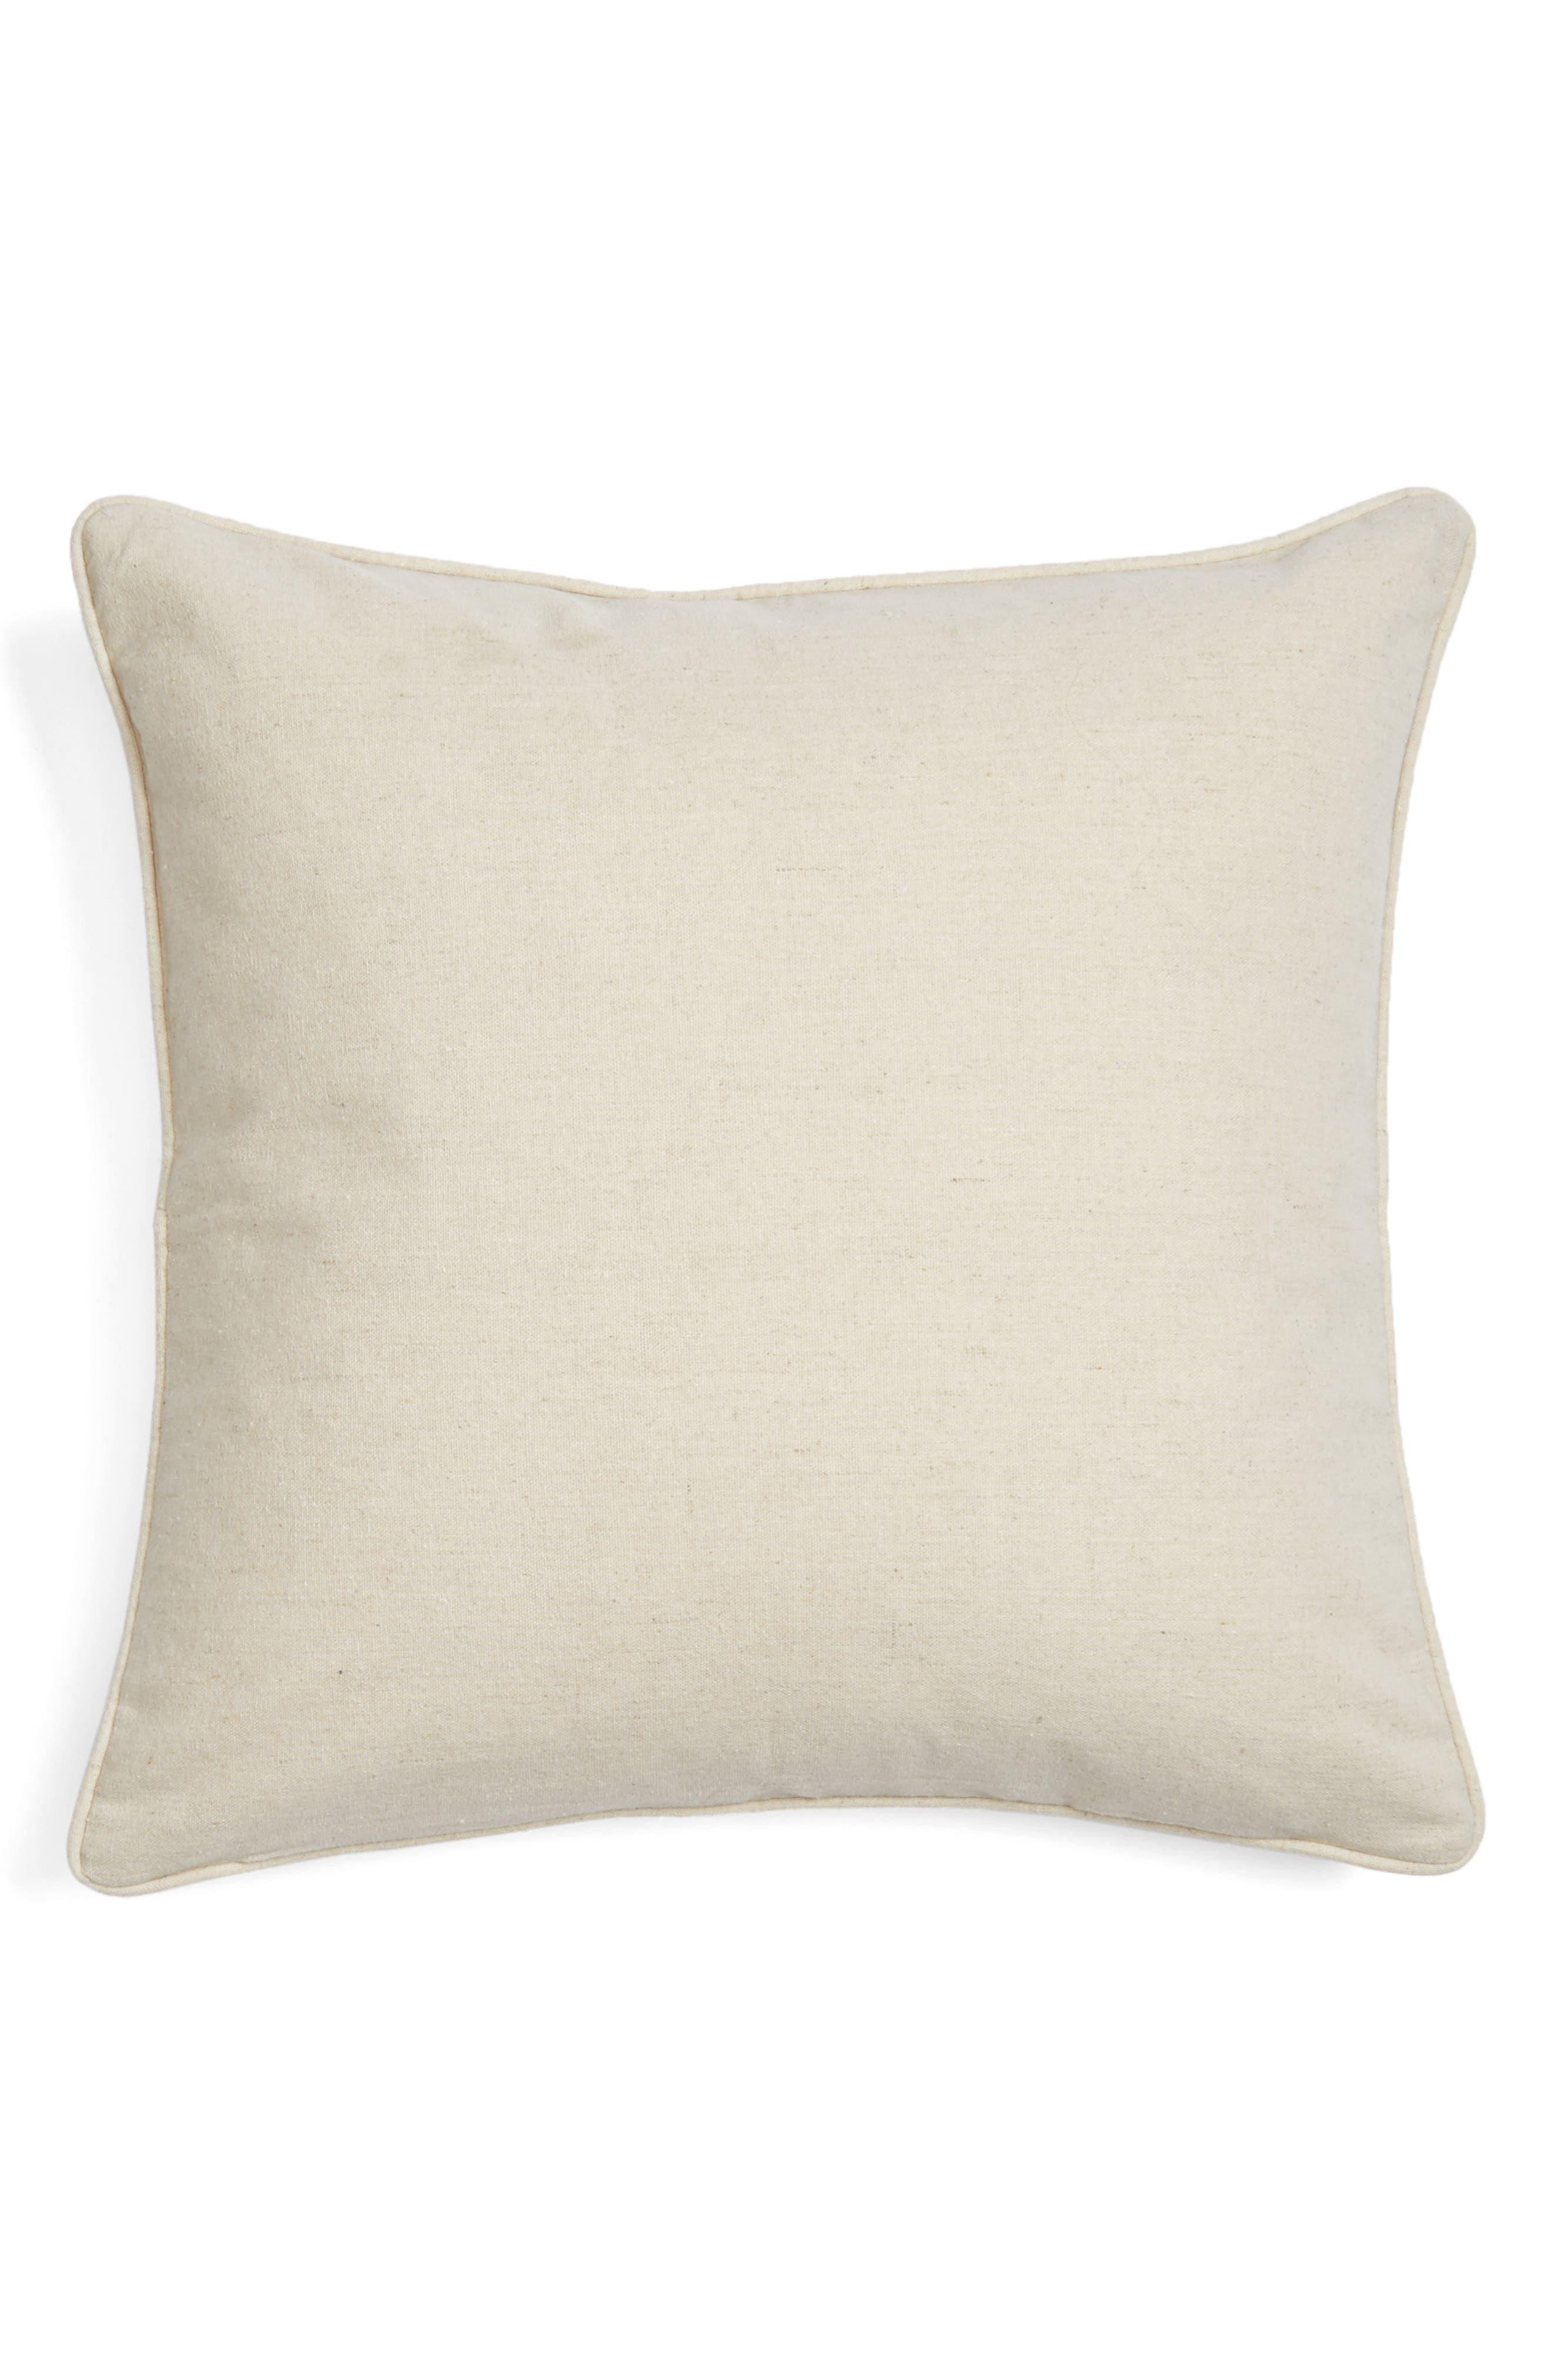 Pinch Mudcloth Pillow,                             Alternate thumbnail 2, color,                             Natural